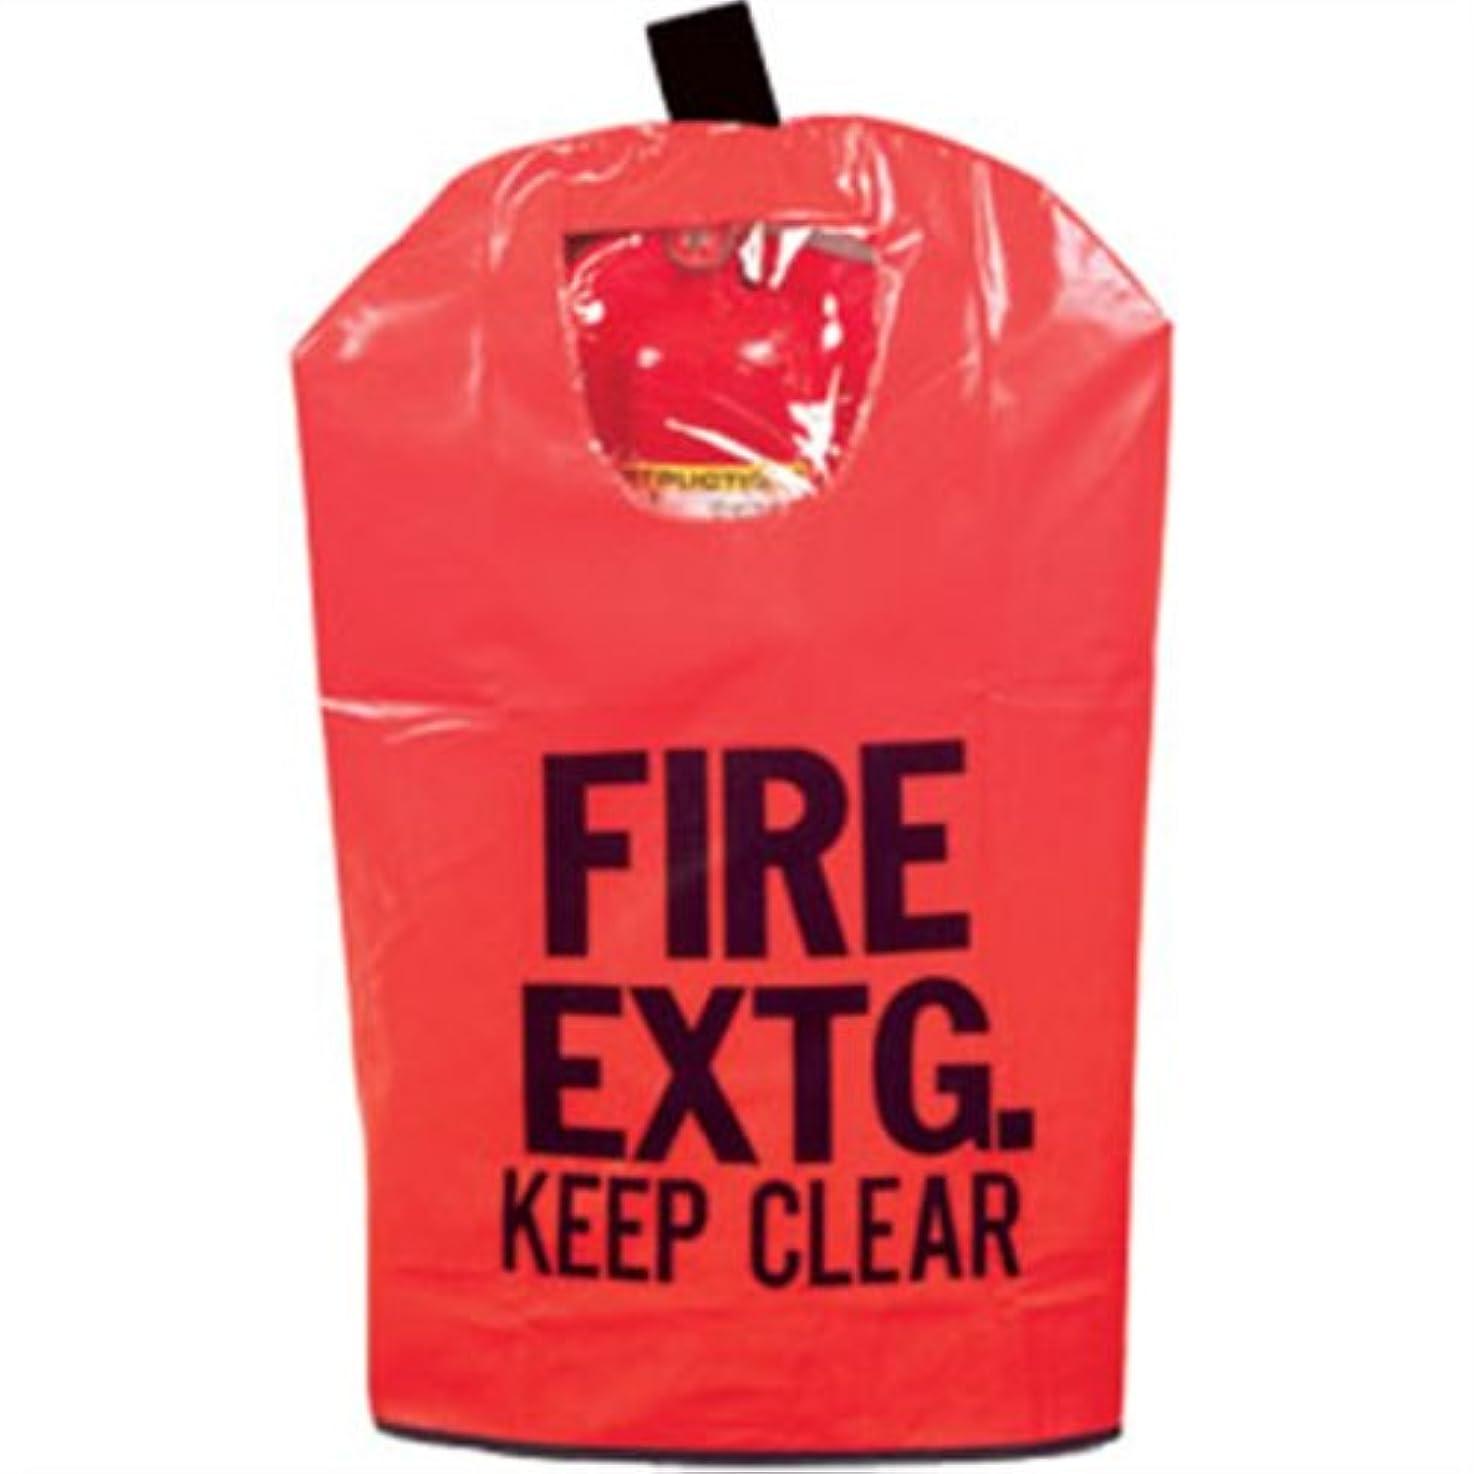 Brooks FEC2W Extinguisher Cover w/ Window, Medium, 25